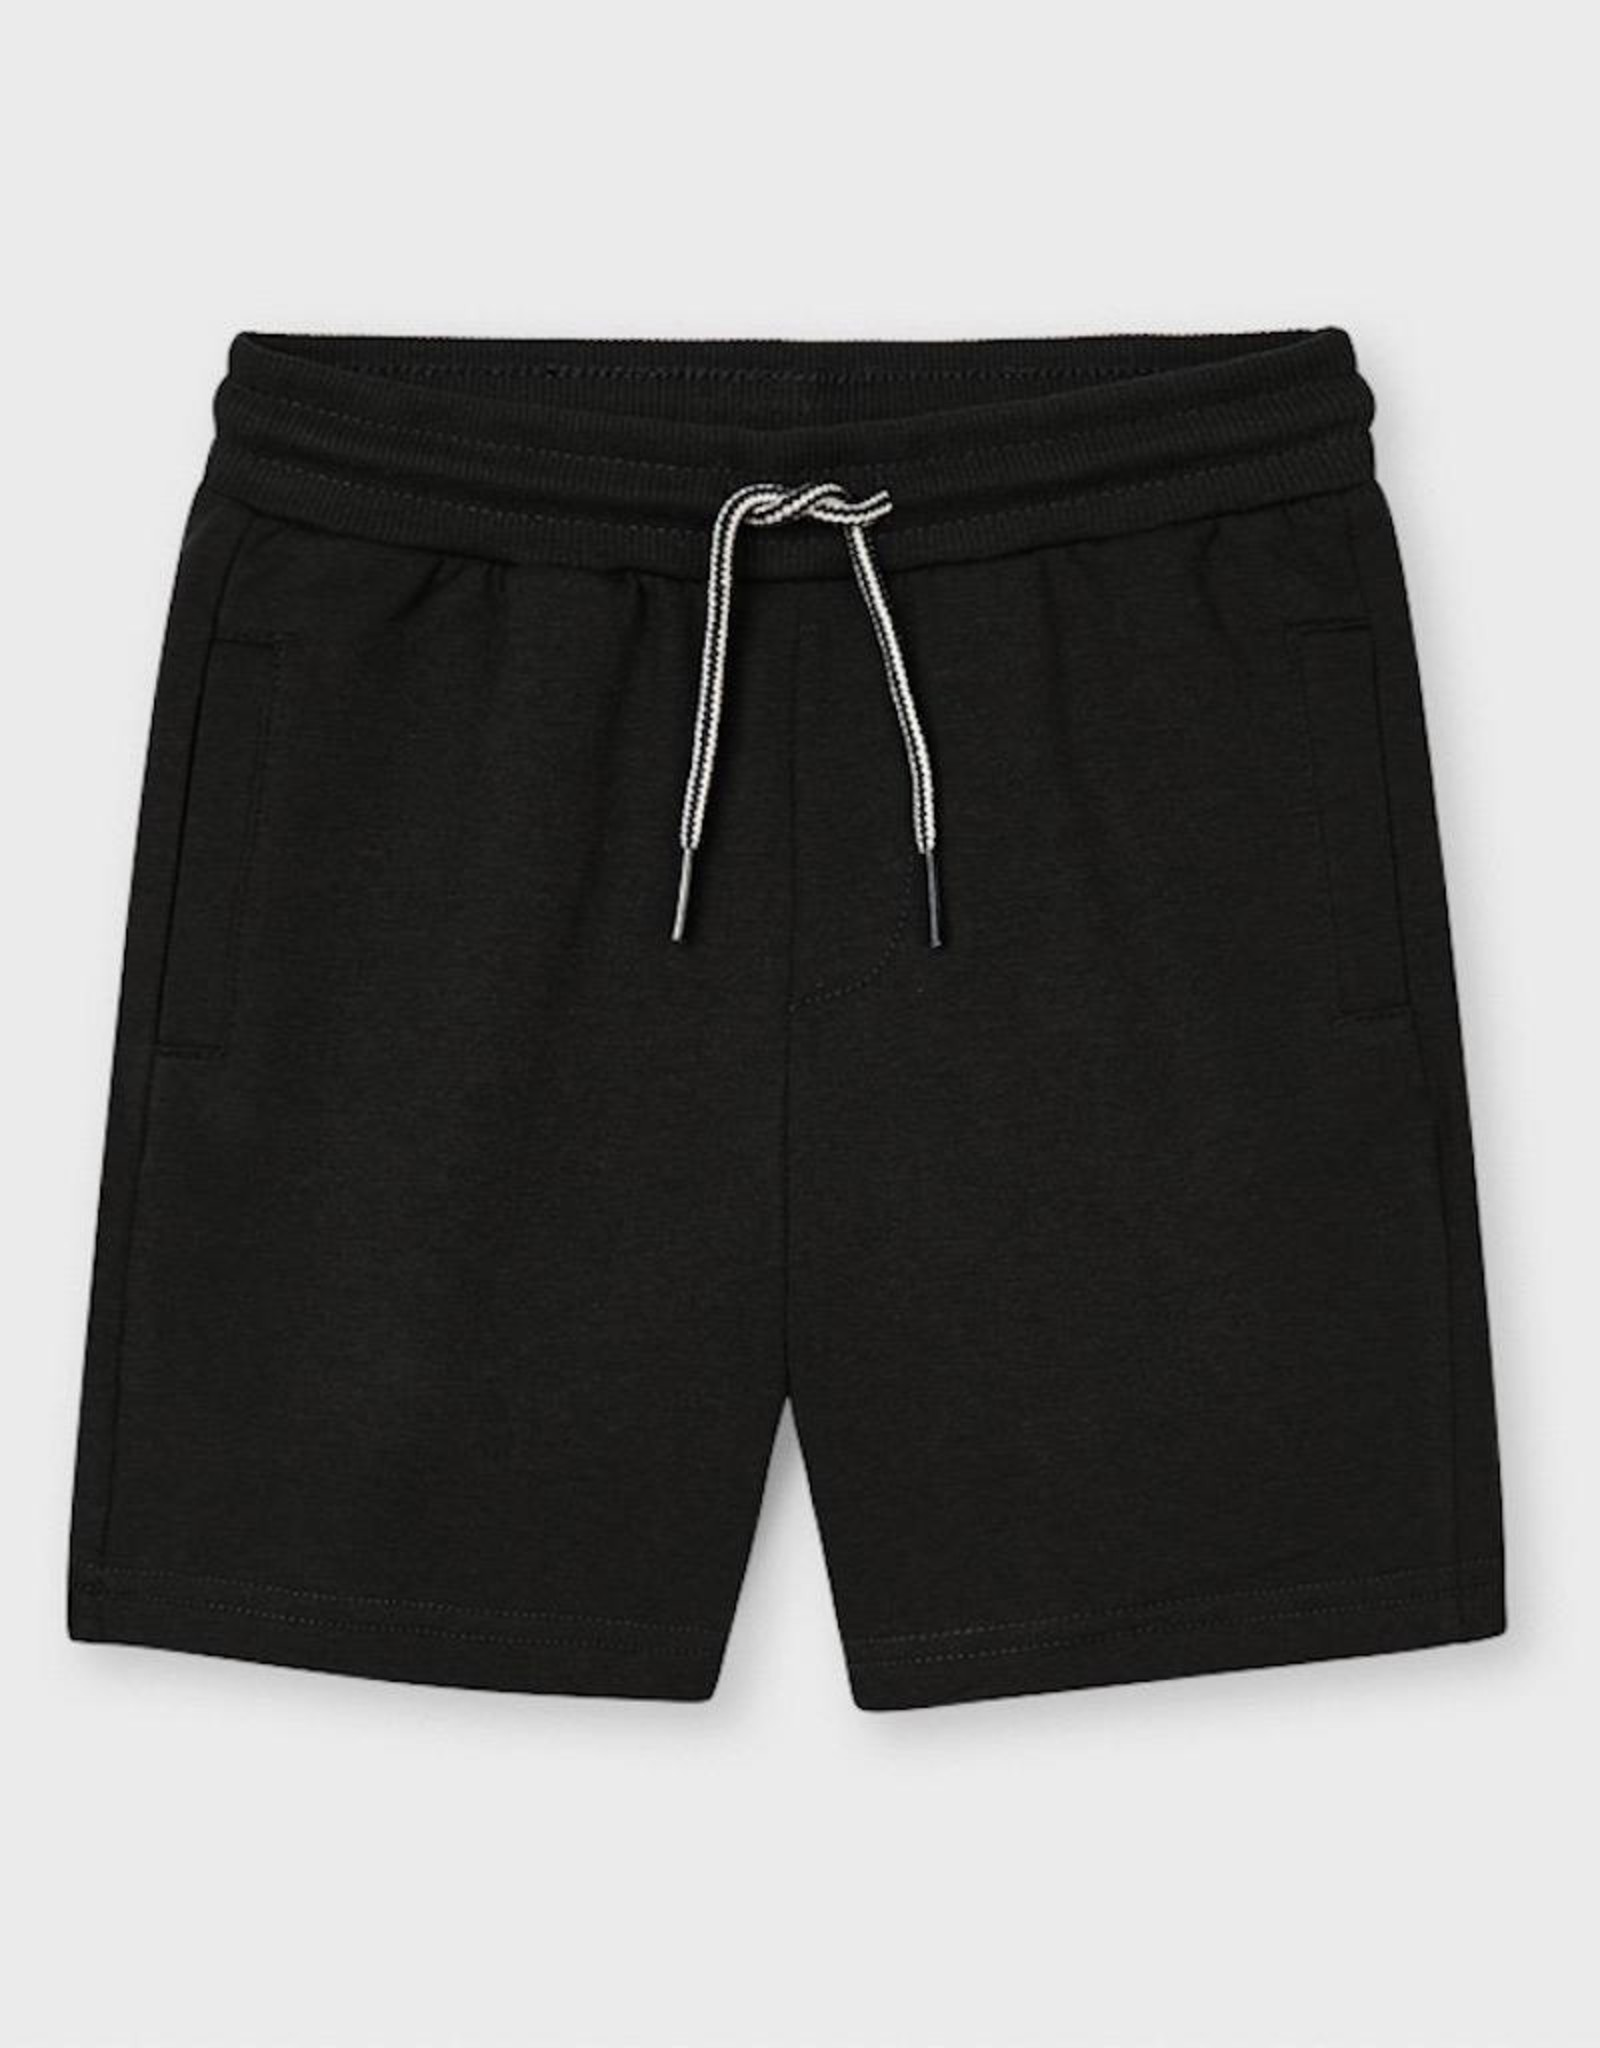 Mayoral Vynil Sporty Shorts